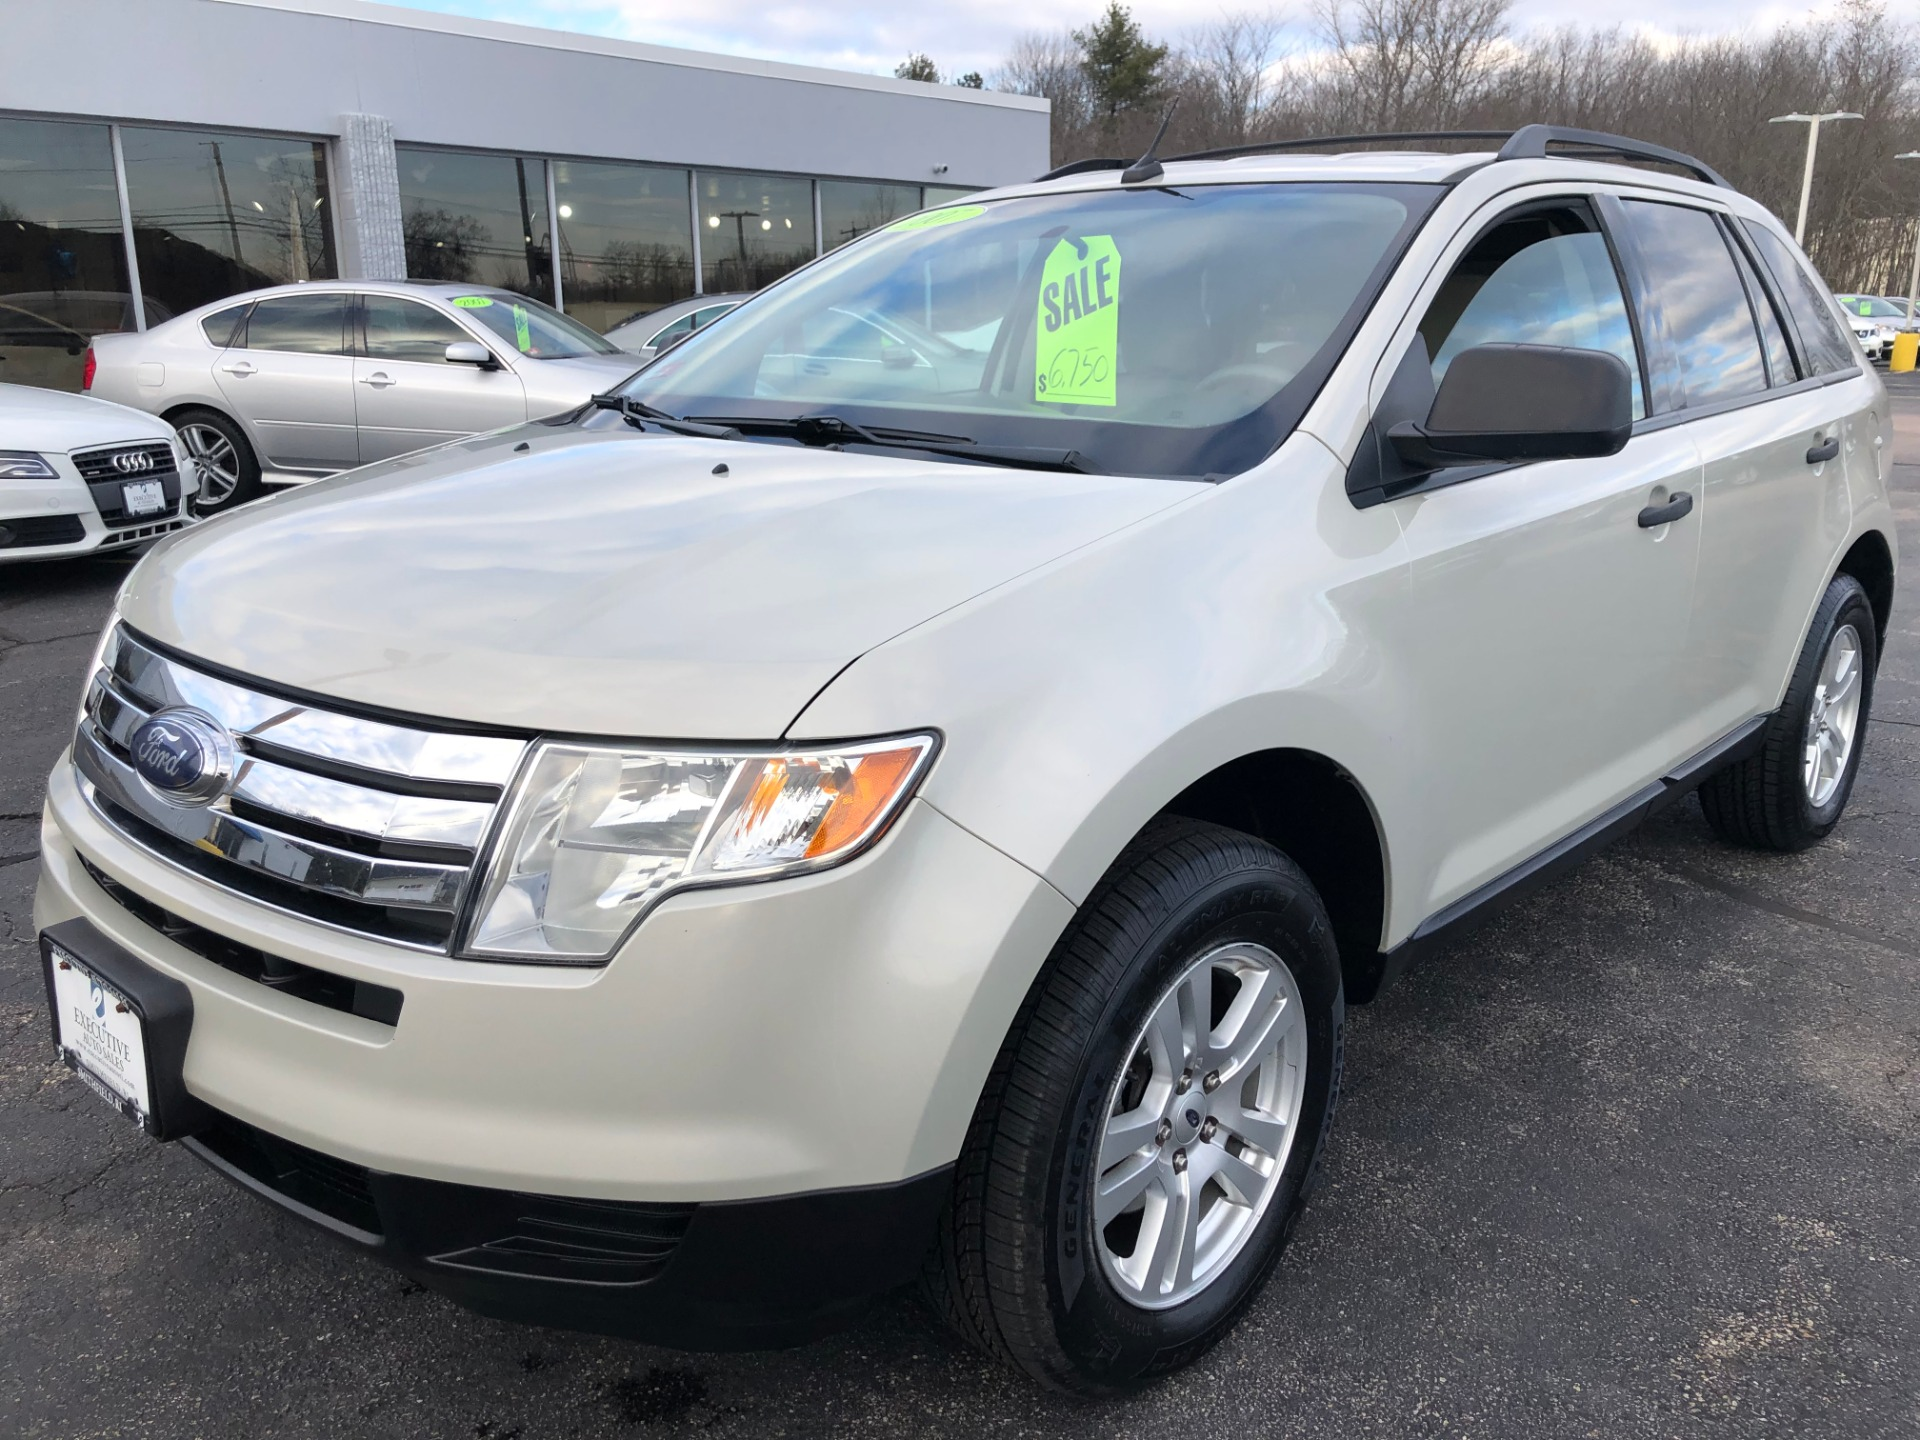 Used Ford Edge For Sale >> Used 2007 FORD EDGE SE For Sale ($5,999) | Executive Auto ...